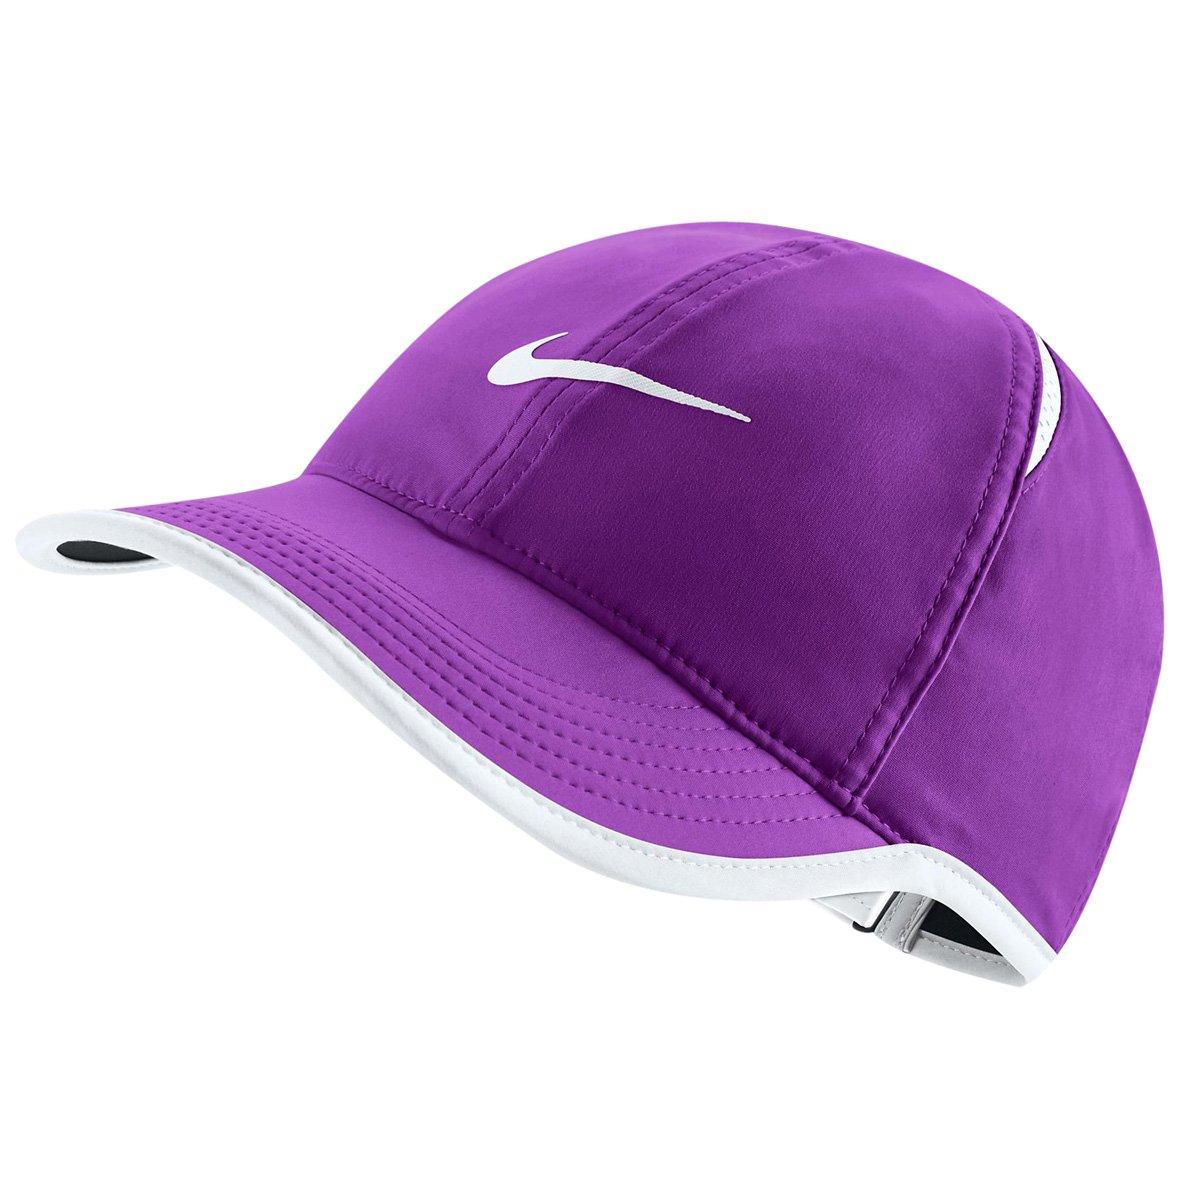 Boné Nike Aerobill Featherlight 879424-585 Lilas 45a2beedb85